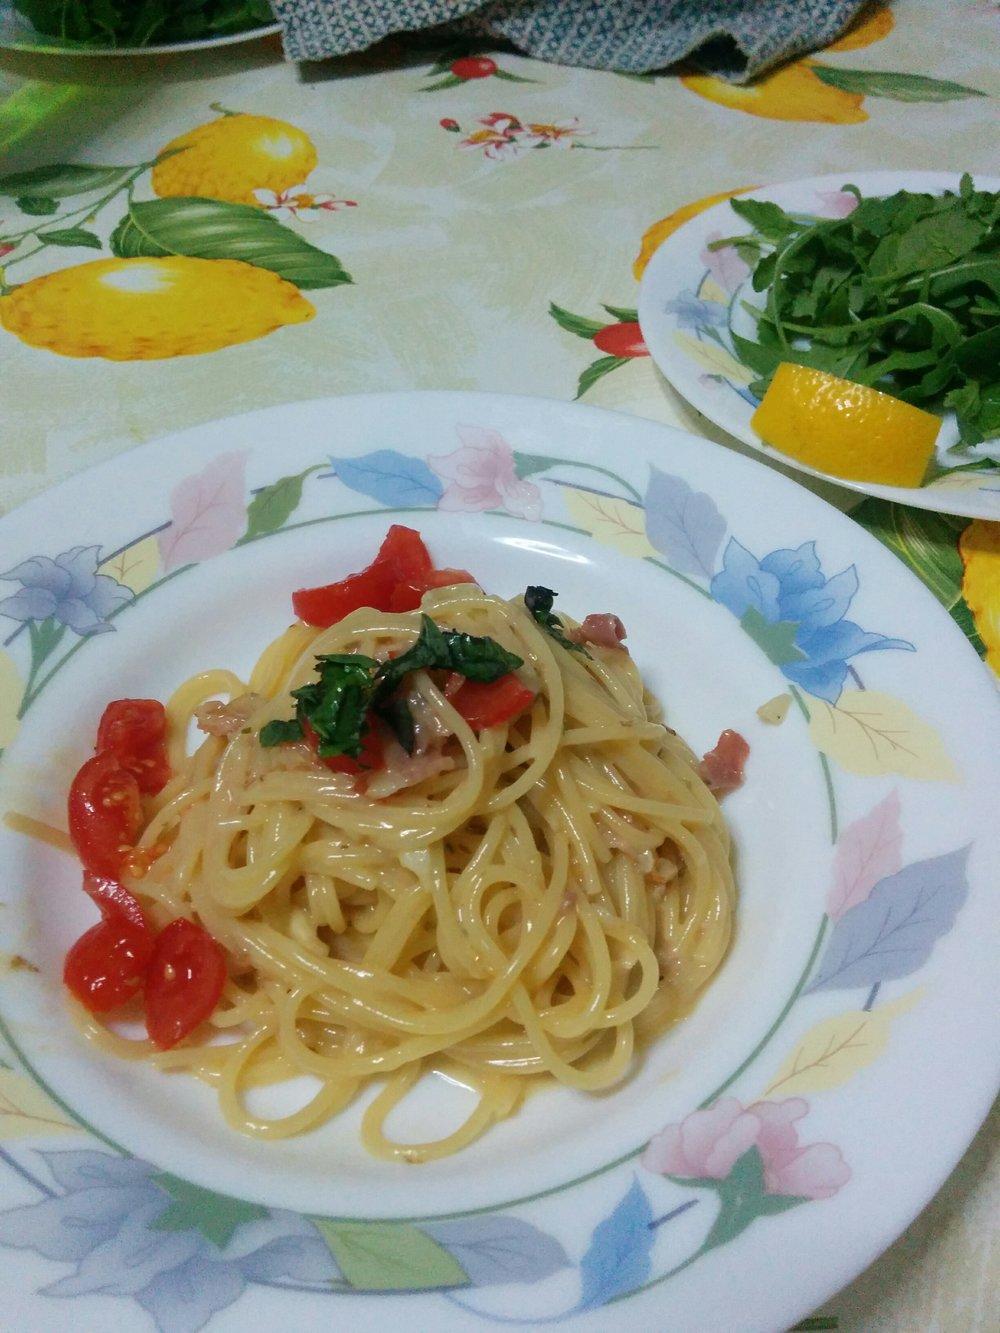 Nick perfected his Pasta Carbonara recipe.